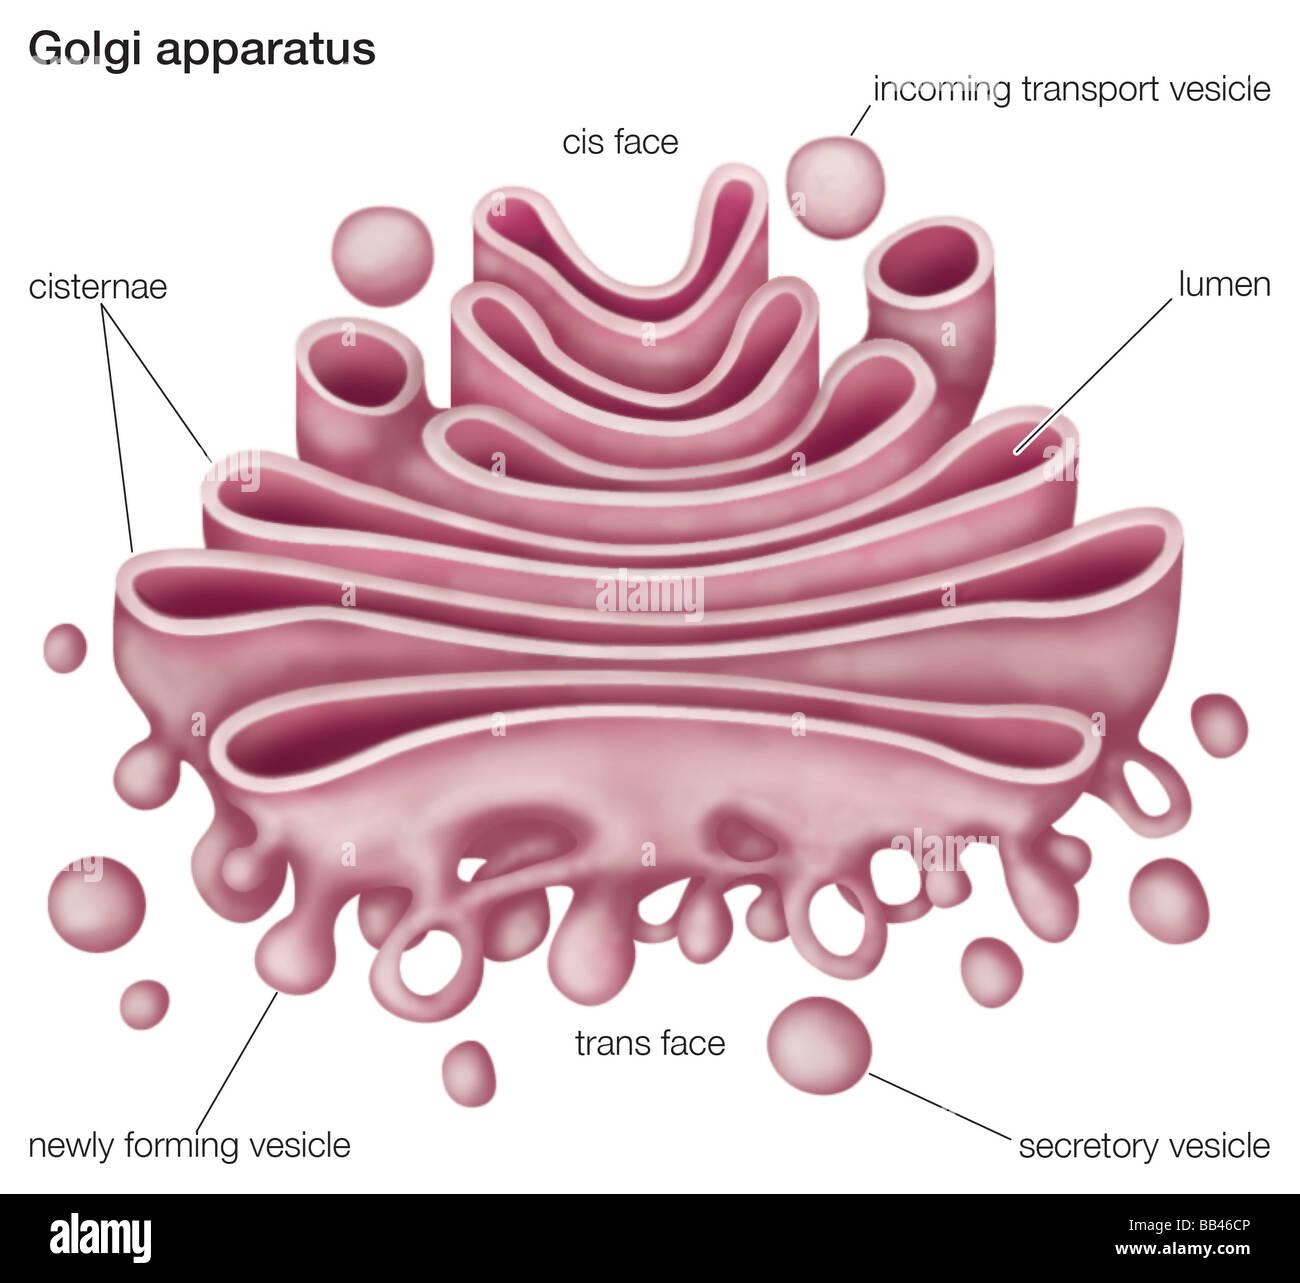 golgi apparatus stock photos golgi apparatus stock images alamy